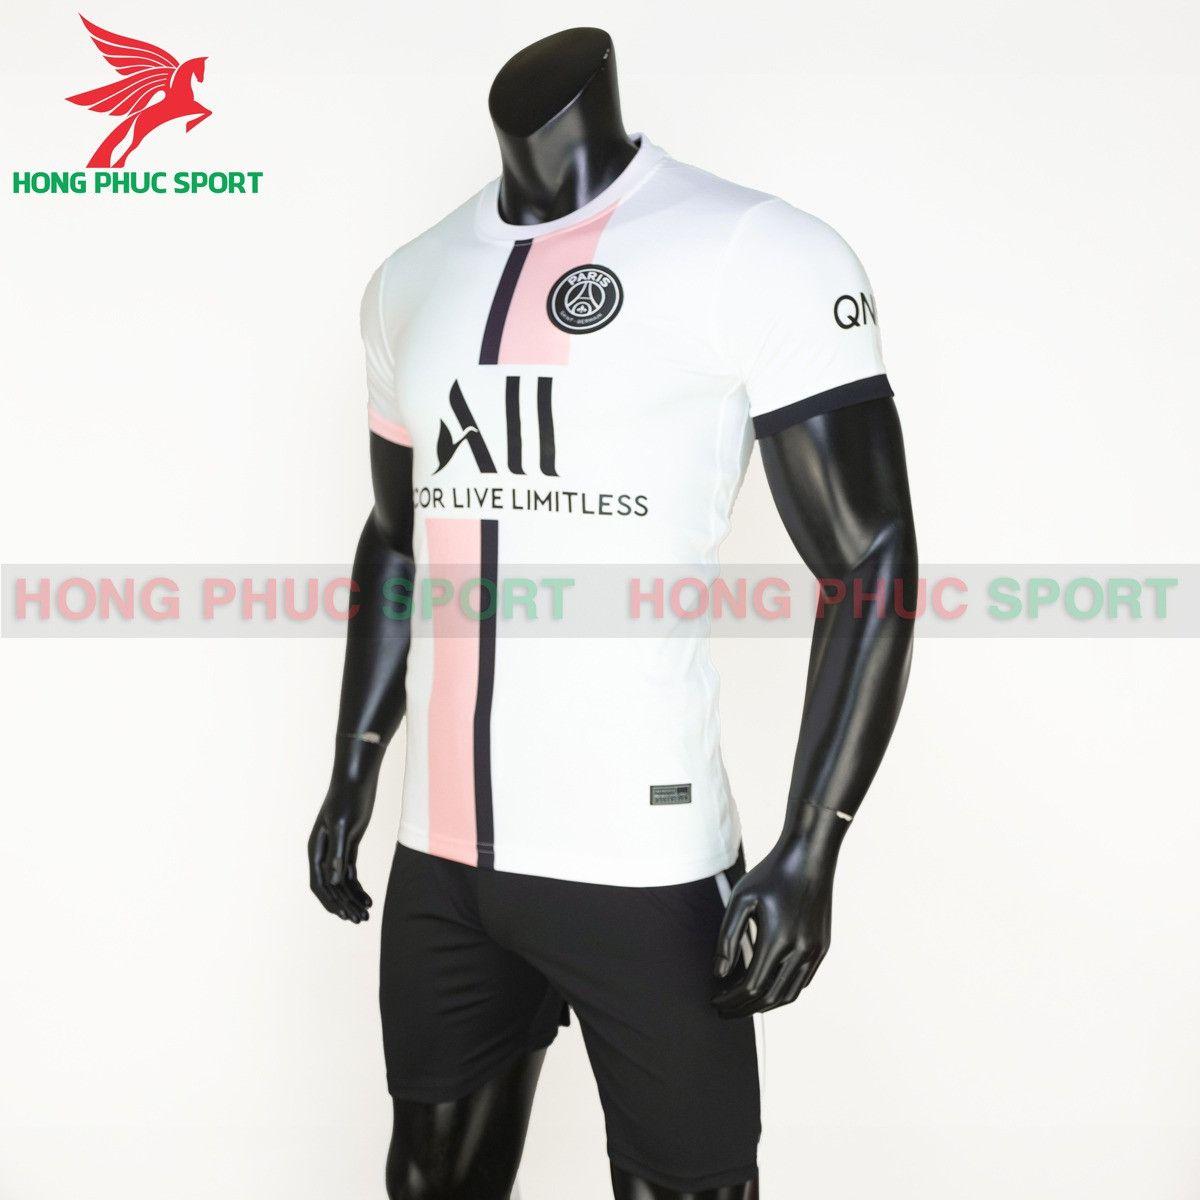 https://cdn.hongphucsport.com/unsafe/s4.shopbay.vn/files/285/ao-dau-psg-2021-2022-san-khach-thailand-5-6149b41a05c44.jpg